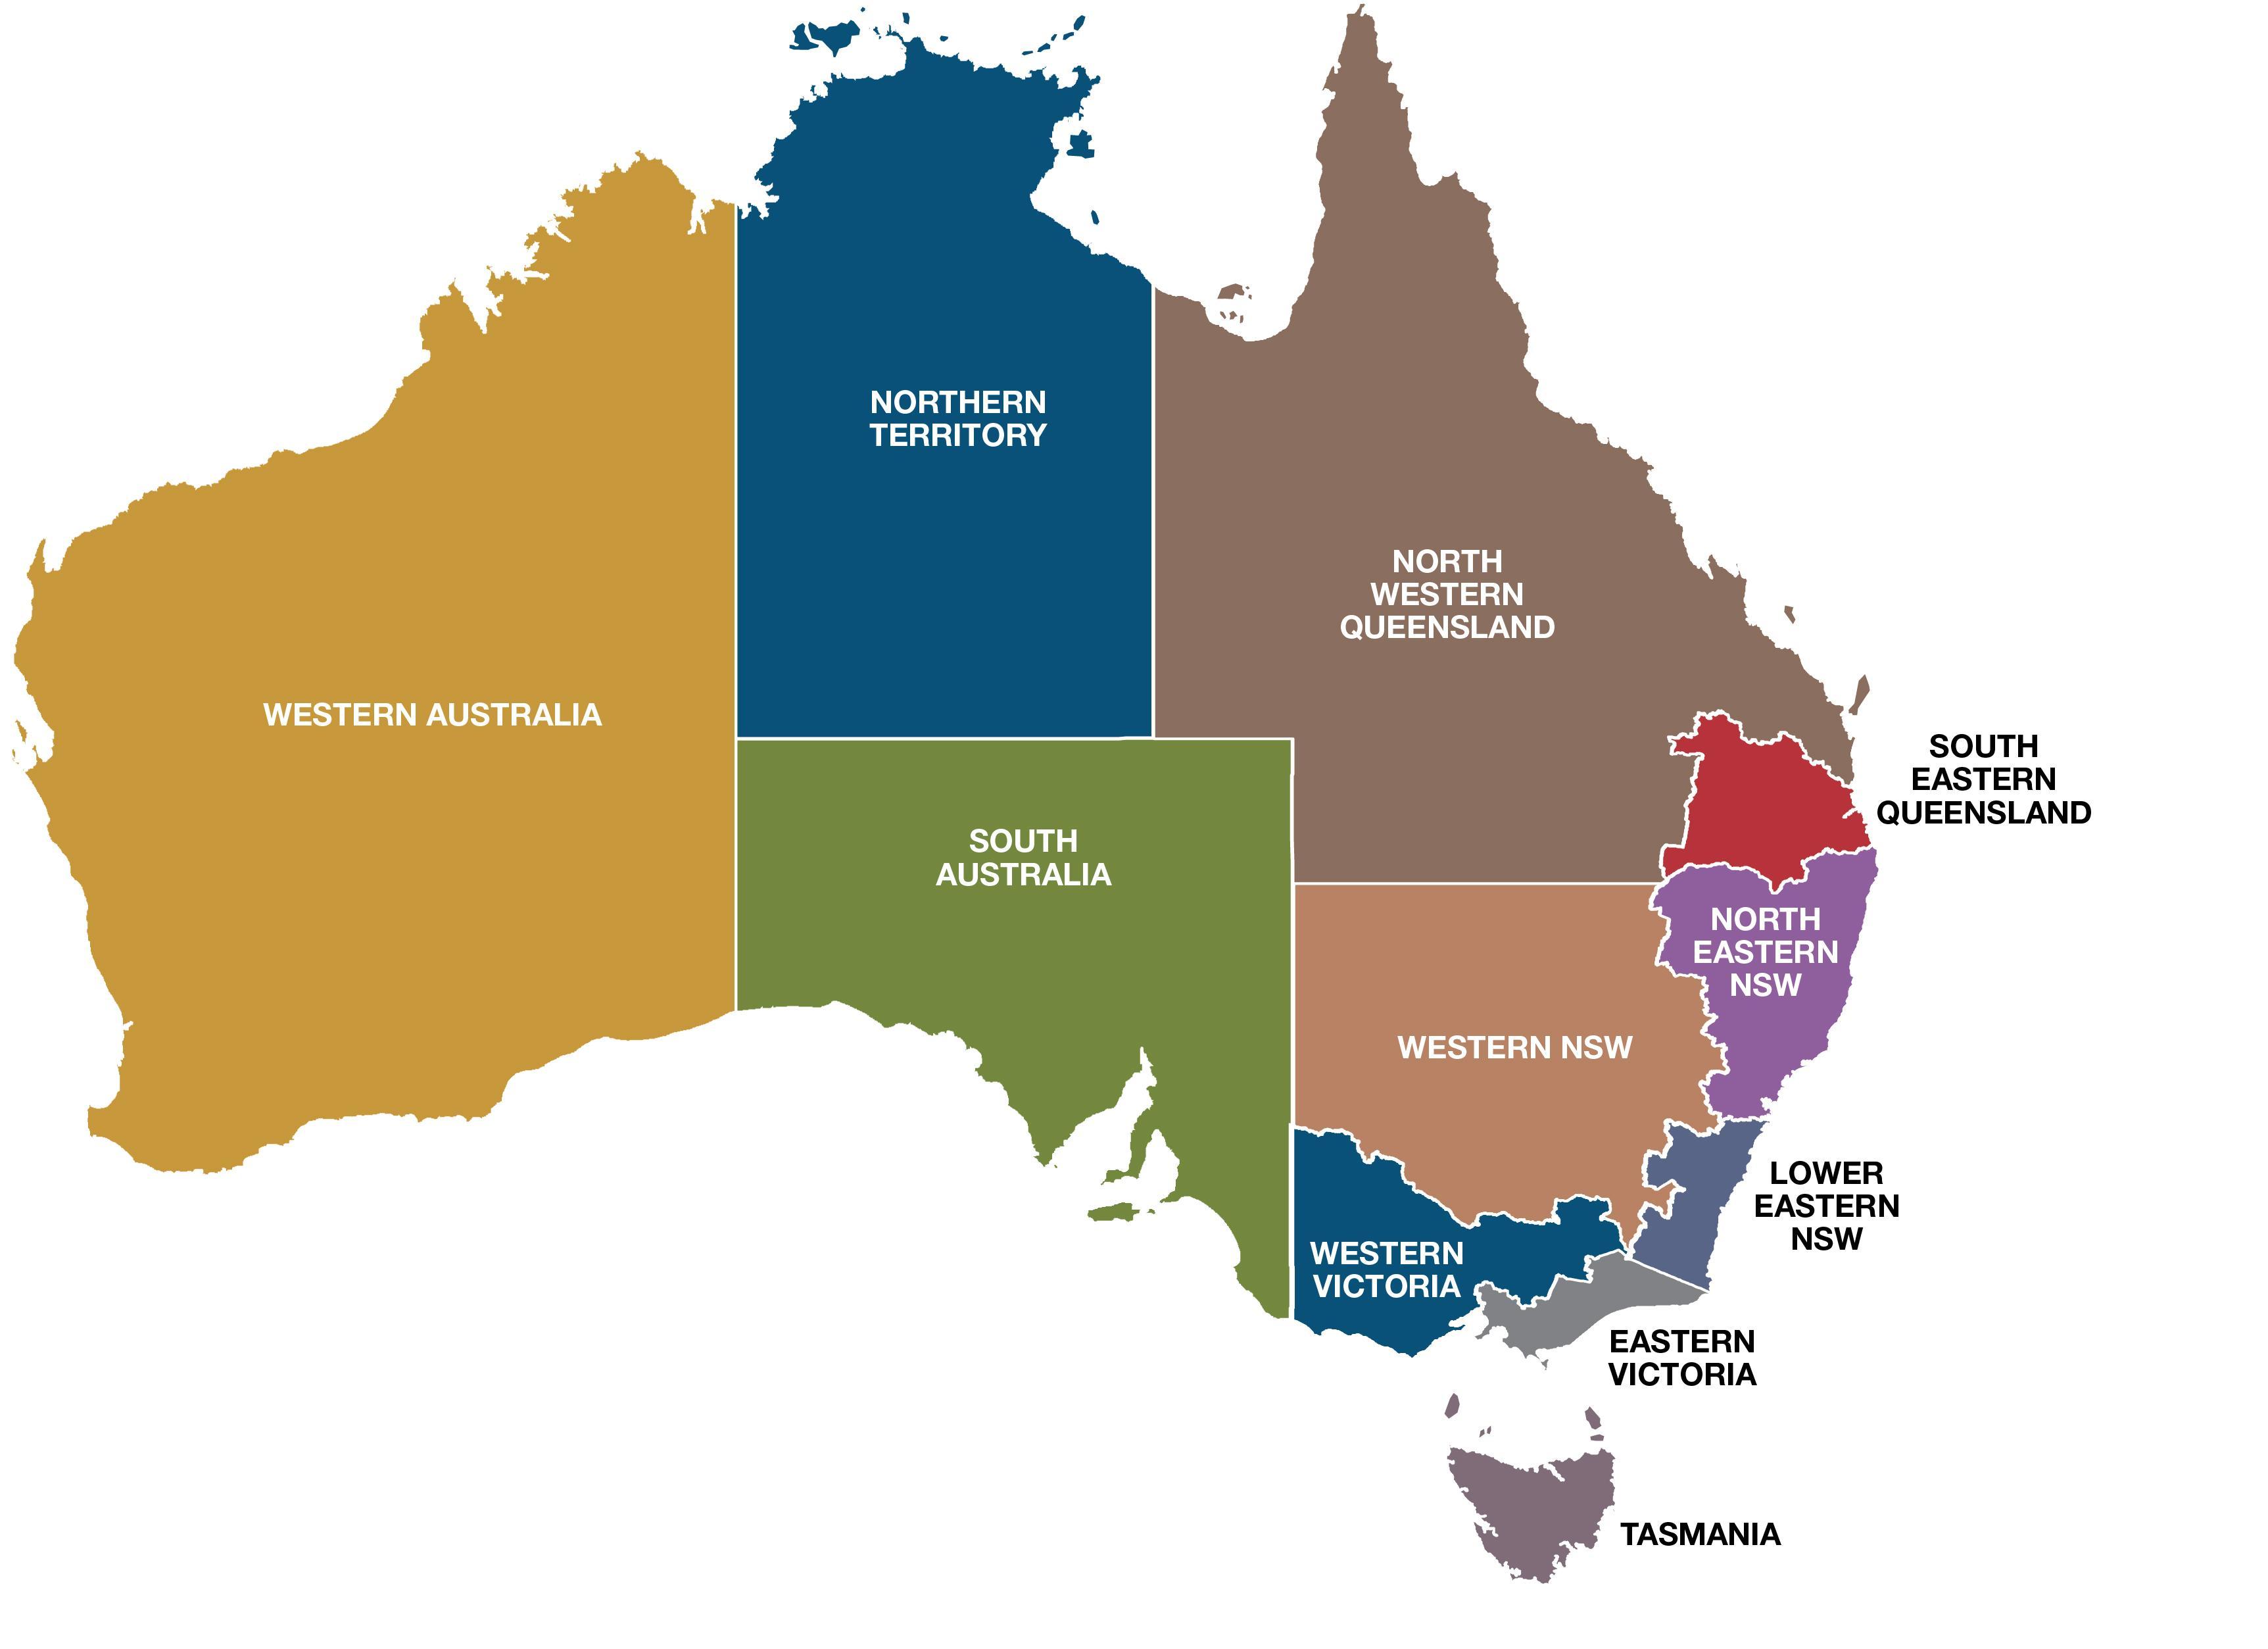 Australien Regioner Kort Kort Over Australien Regioner